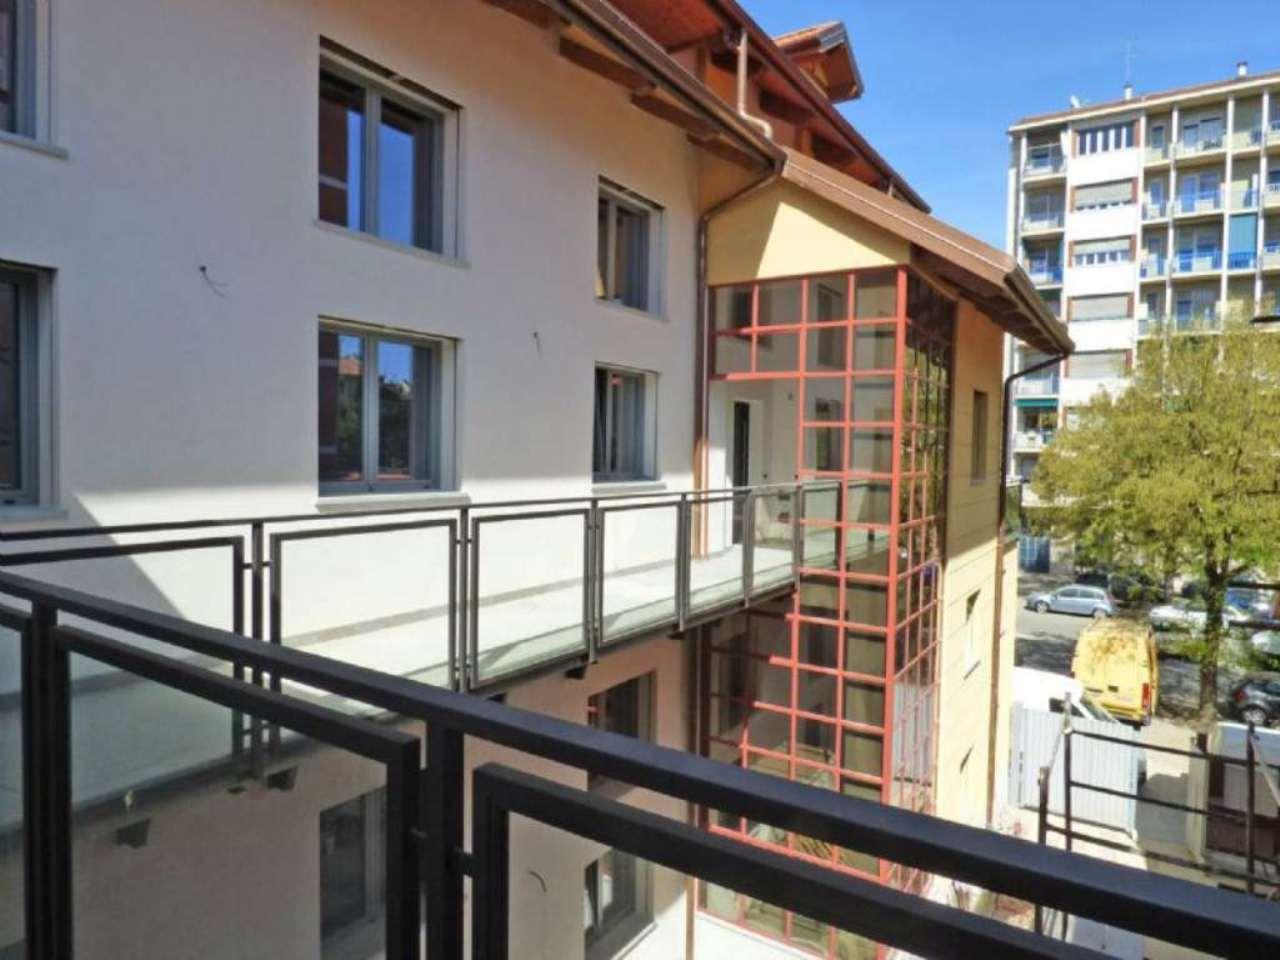 Bilocale Torino Corso Verona 4